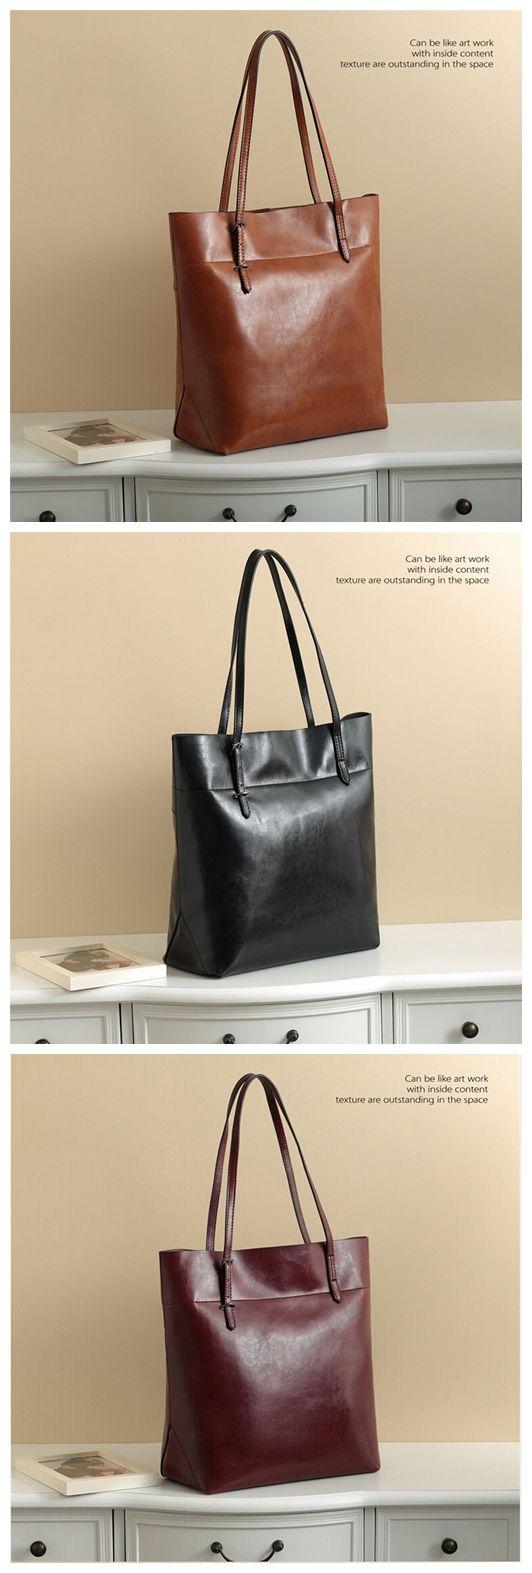 Handmade Genuine Leather Women s Fashion Tote Handbag Shoulder Bag 14149 ad6ac7d44e